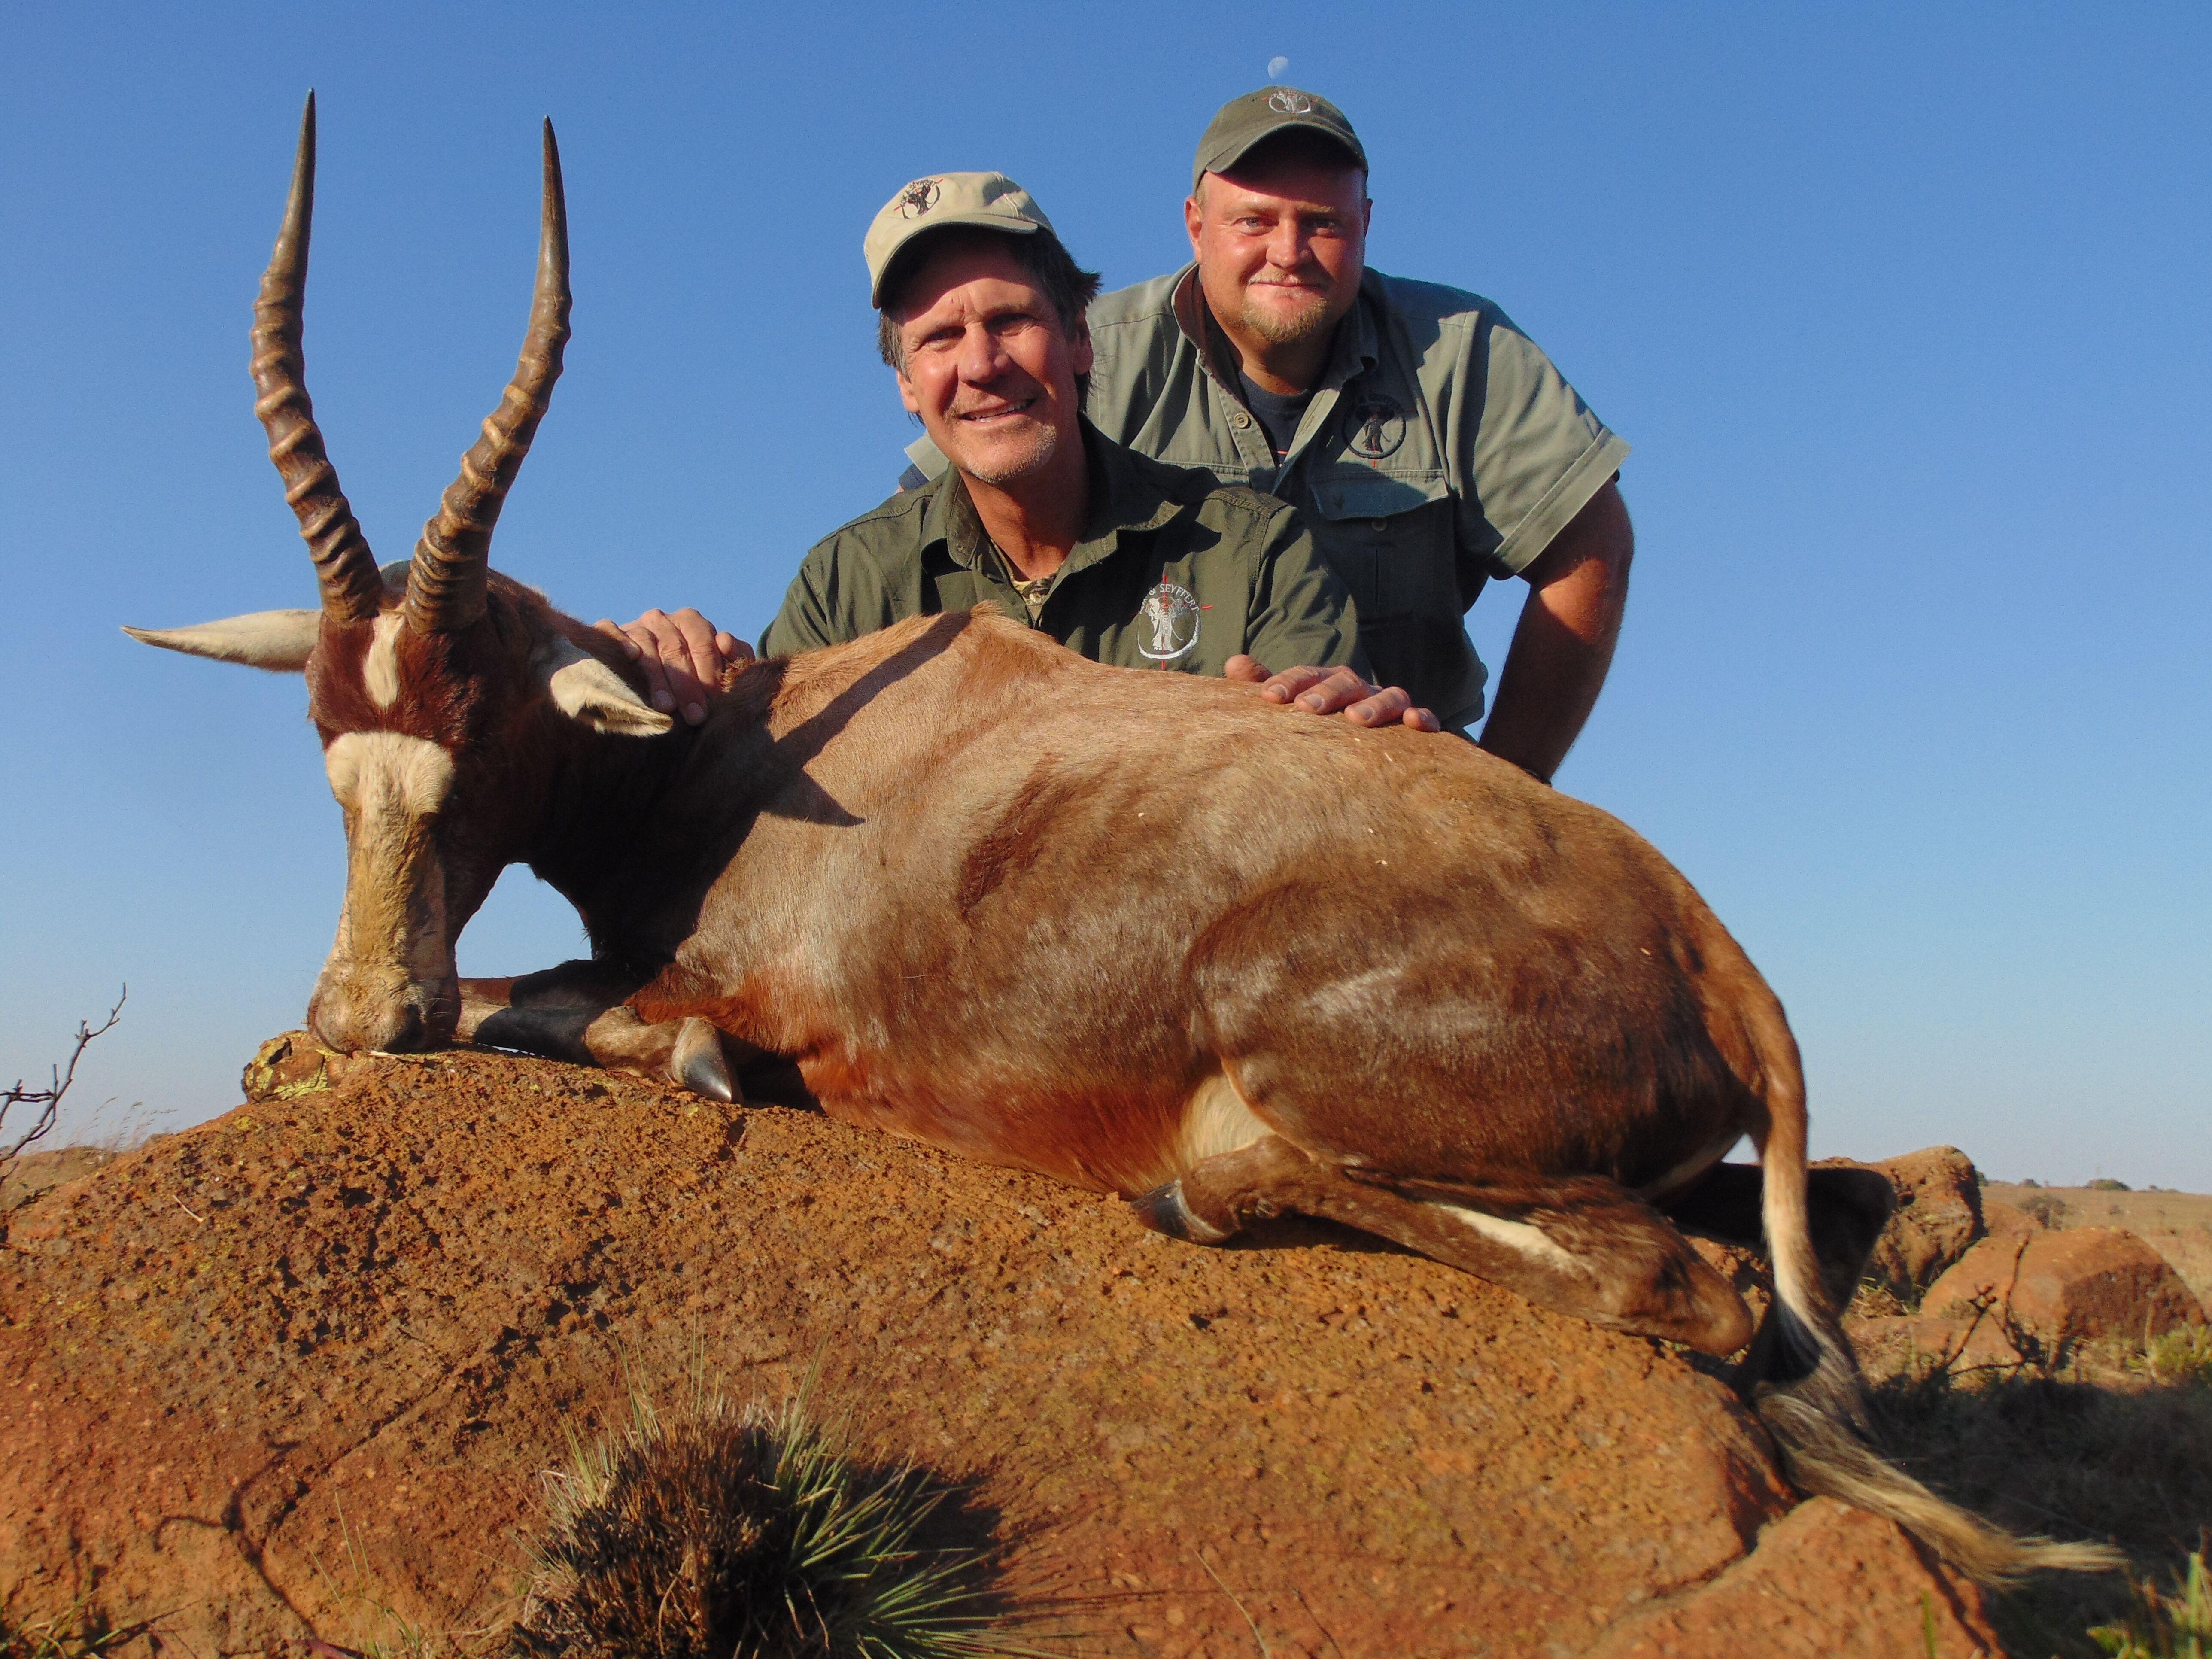 Jakt i Afrika - rifle jakt, bowhunting, slettene spillet og afrikansk Big 5 jakt